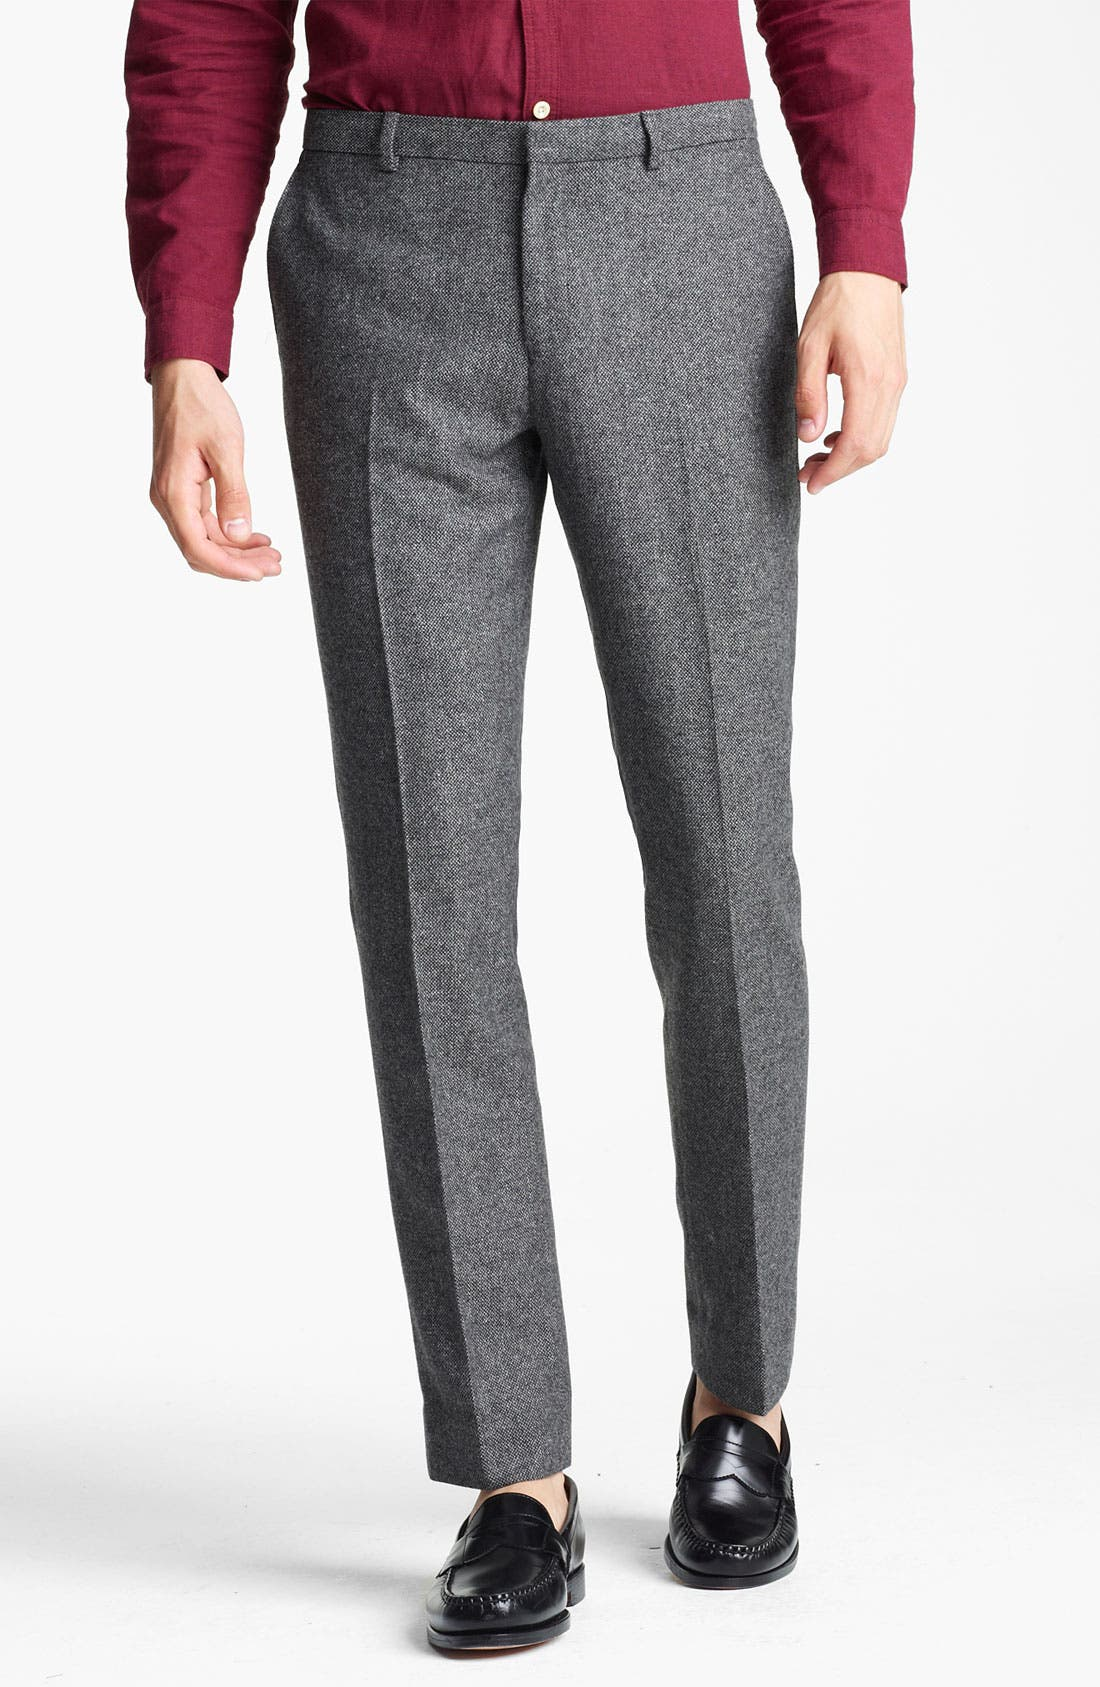 TOPMAN 'Vento' Tweed Skinny Trousers, Main, color, 020